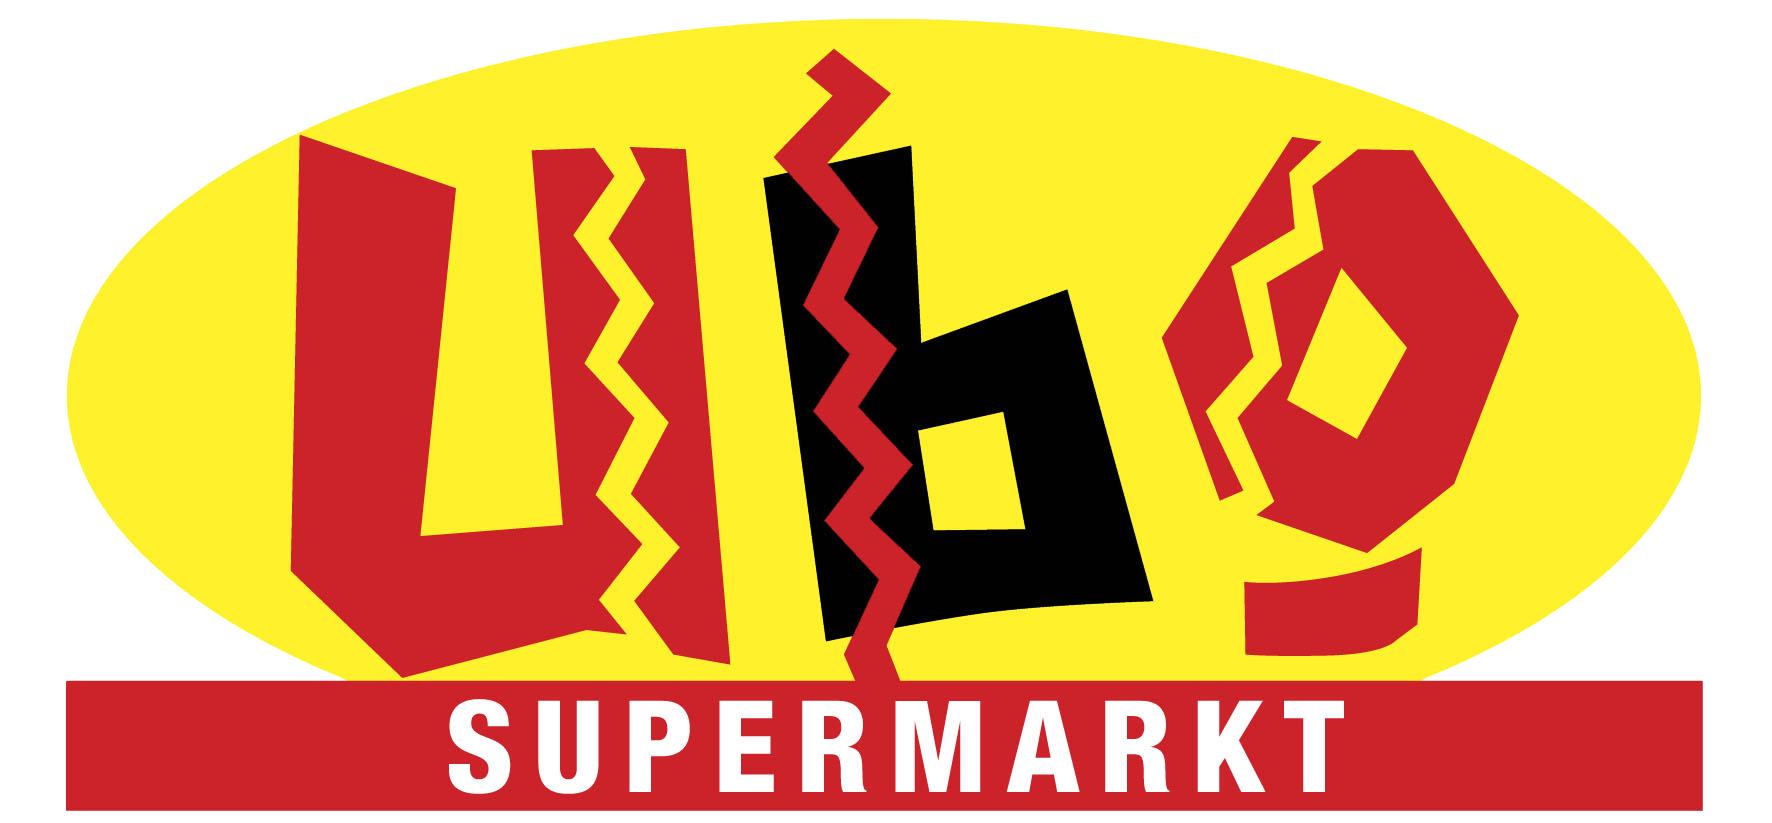 UBO Supermarkt